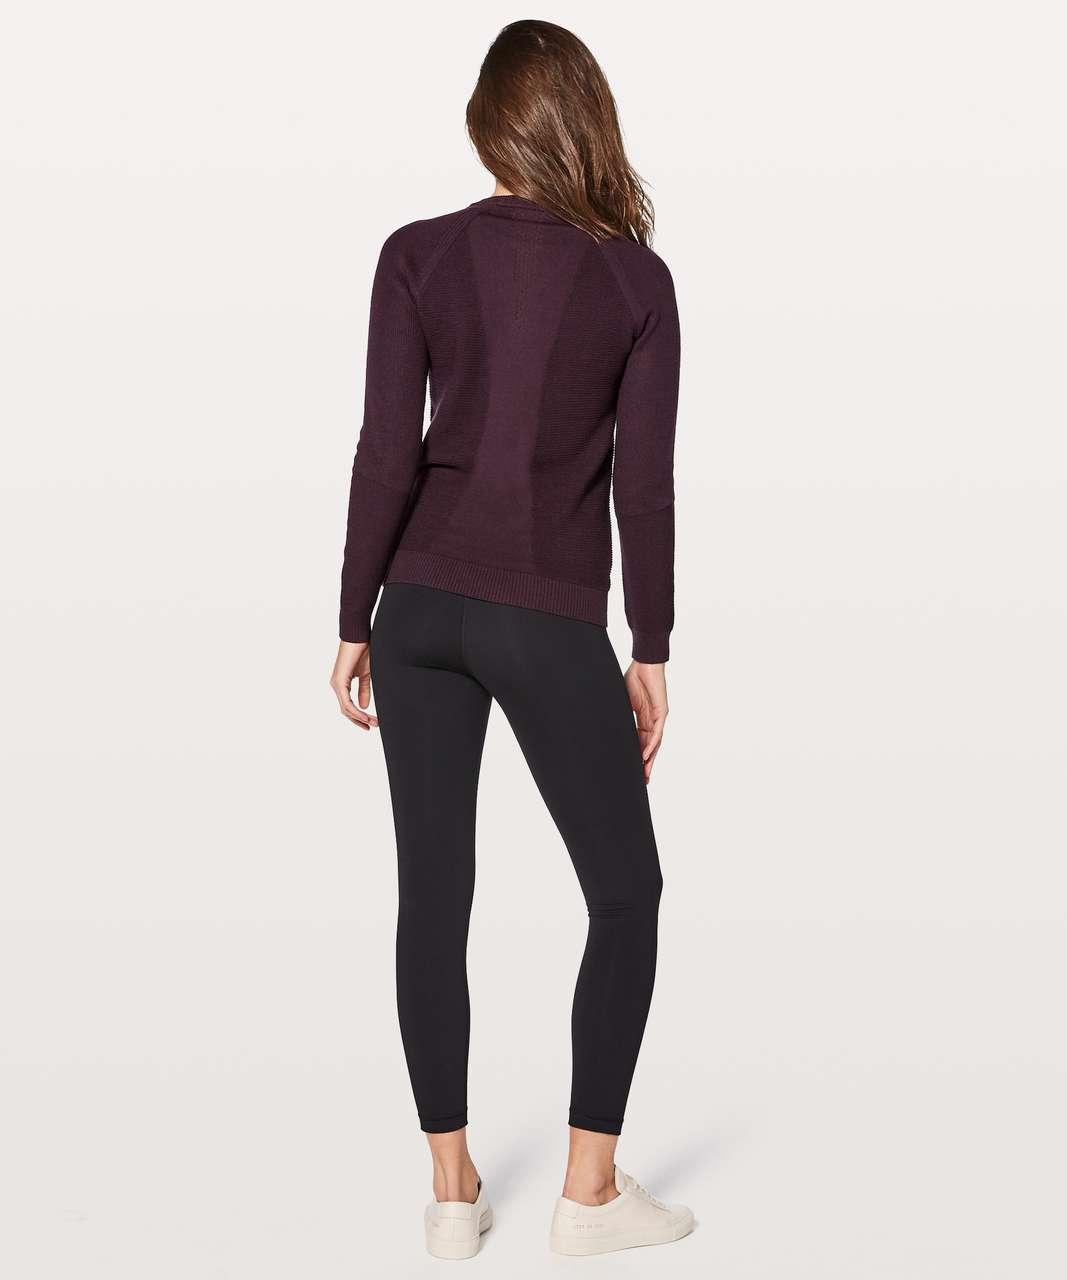 Lululemon Simply Wool Sweater - Black Cherry